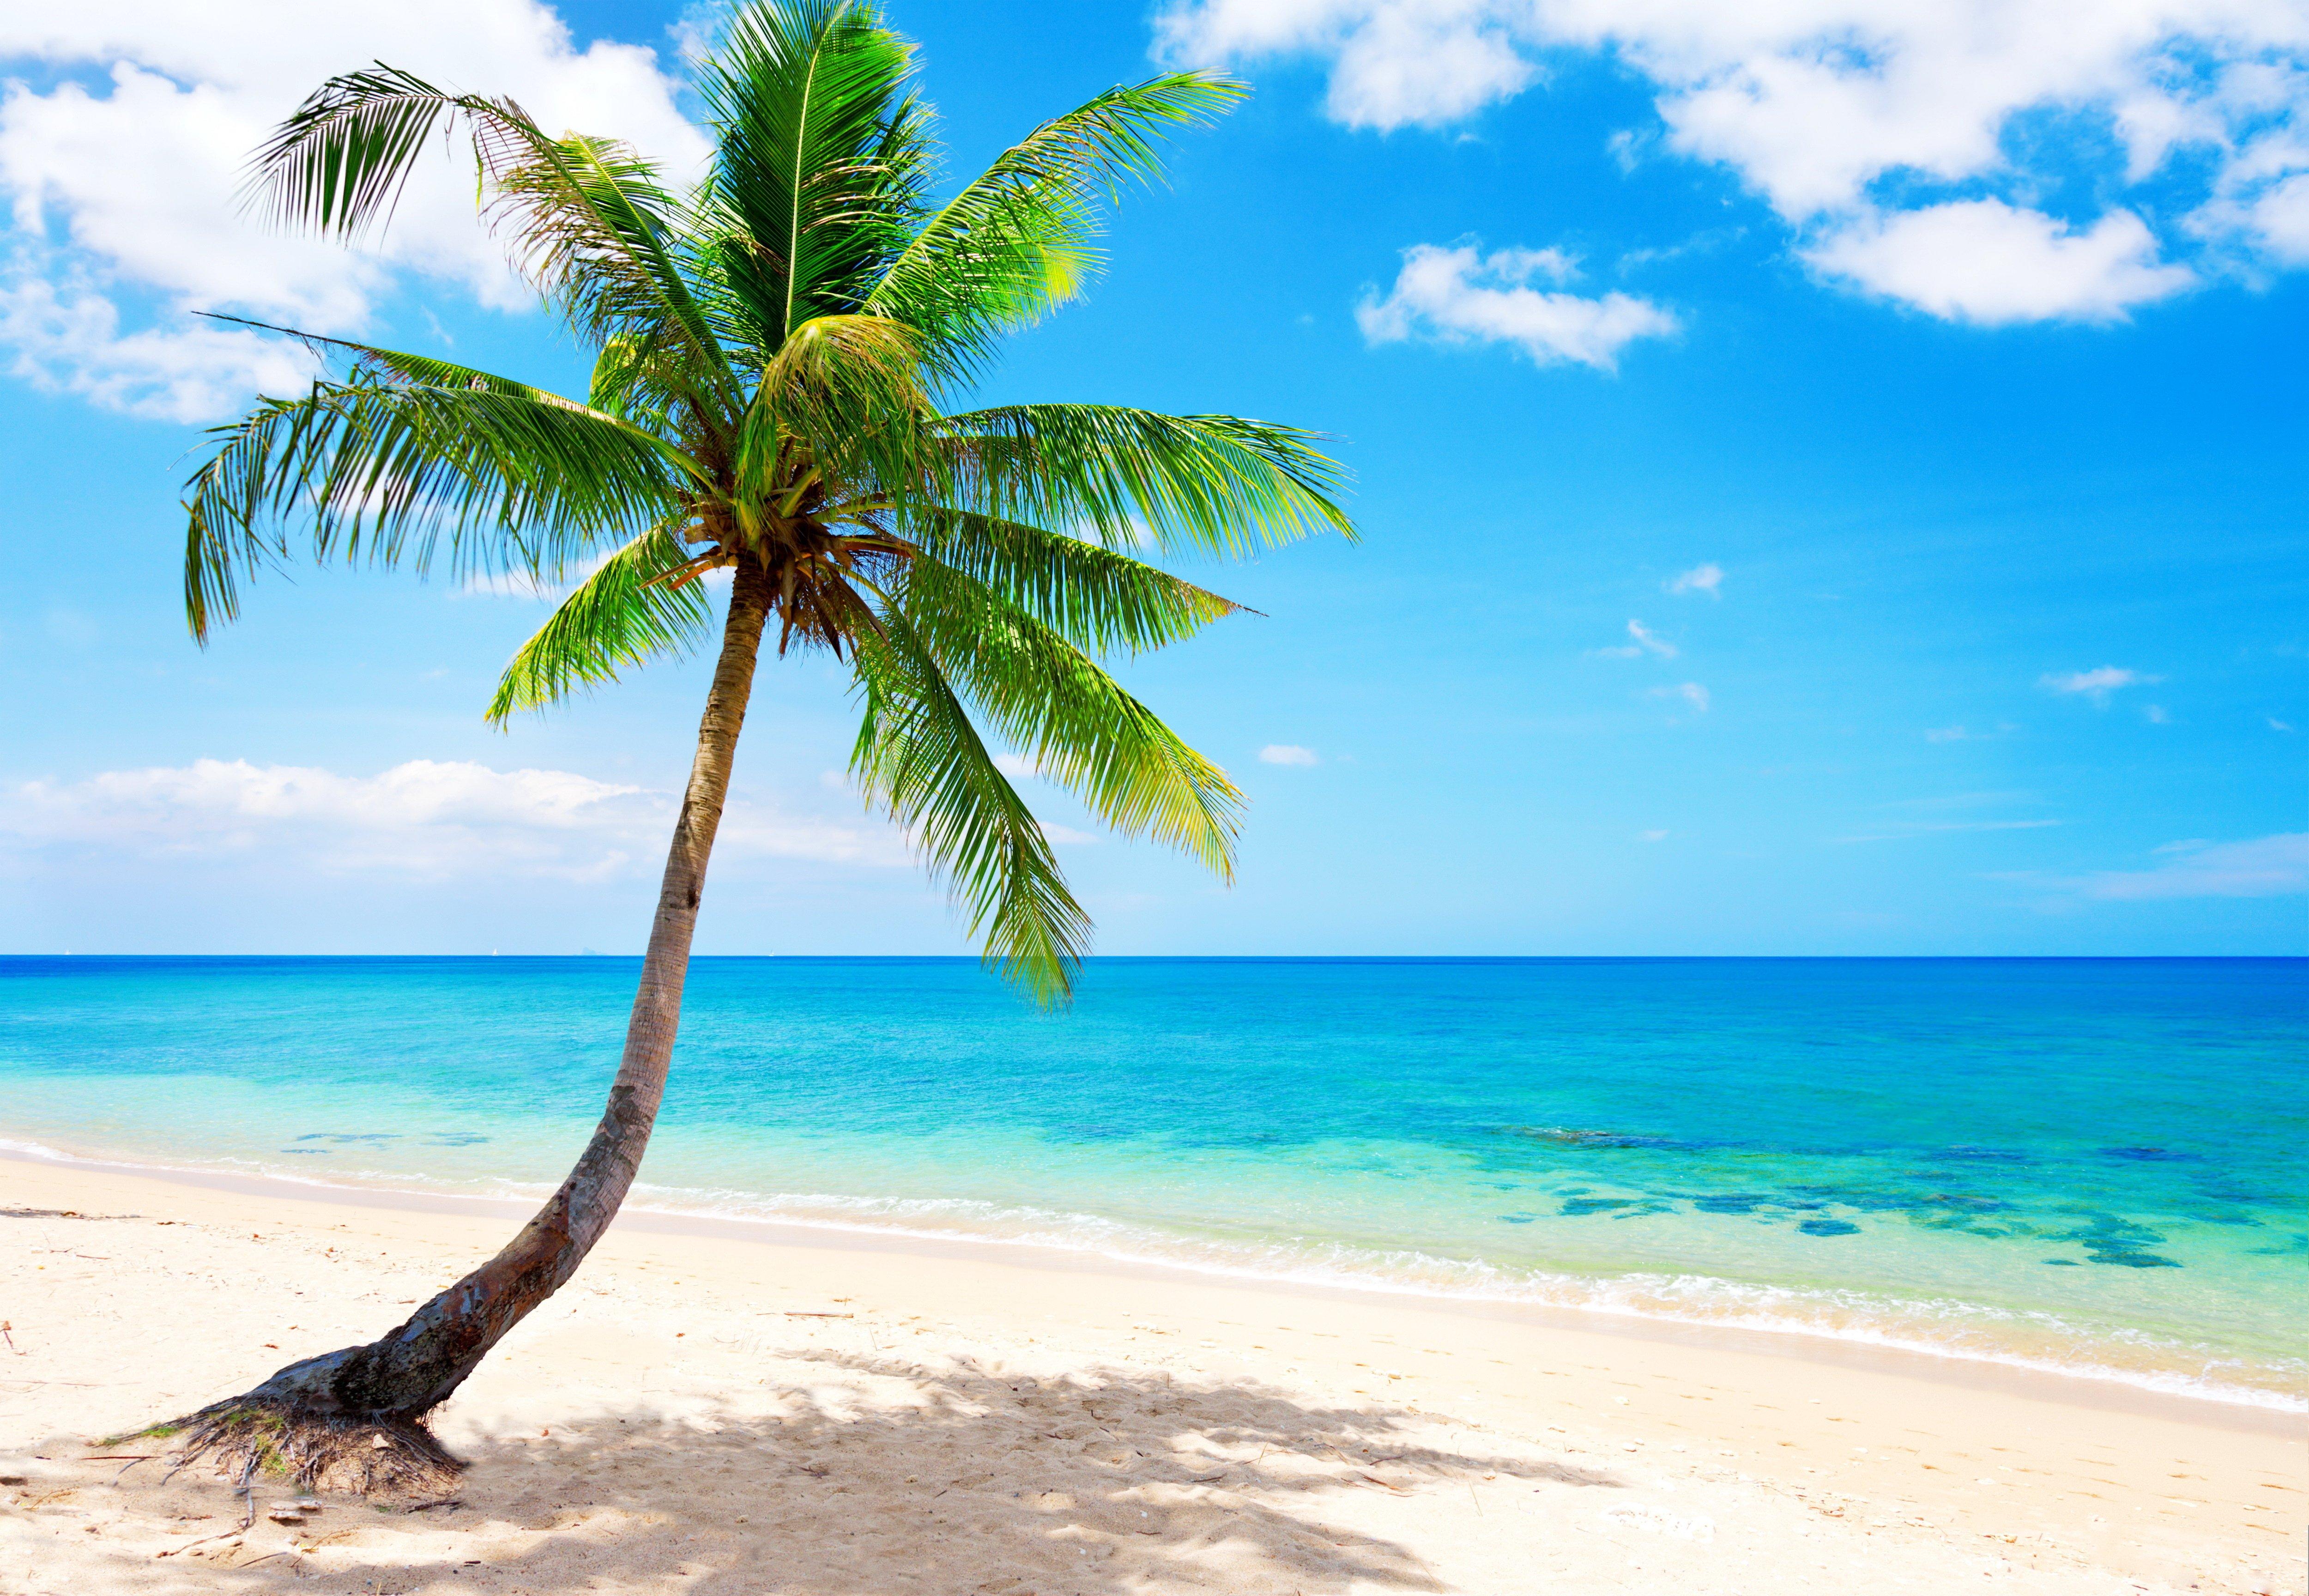 Palm paradise emerald ocean tropical coast blue beach sea wallpaper 5000x3456 360256 - Free palm tree screensavers ...